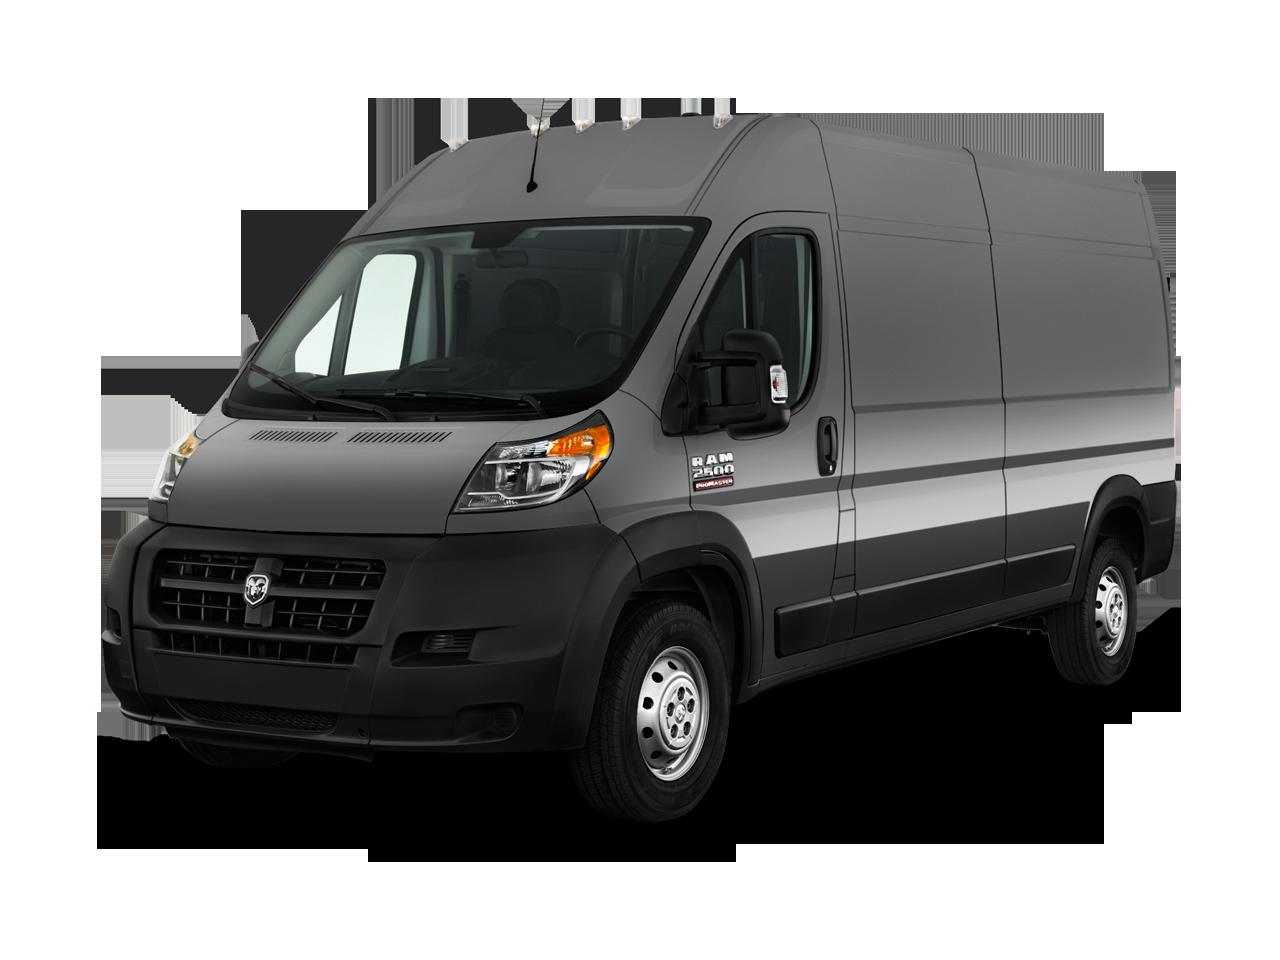 new 2017 ram promaster cargo 159 wb near lawrenceville ga hayes chrysler dodge jeep. Black Bedroom Furniture Sets. Home Design Ideas